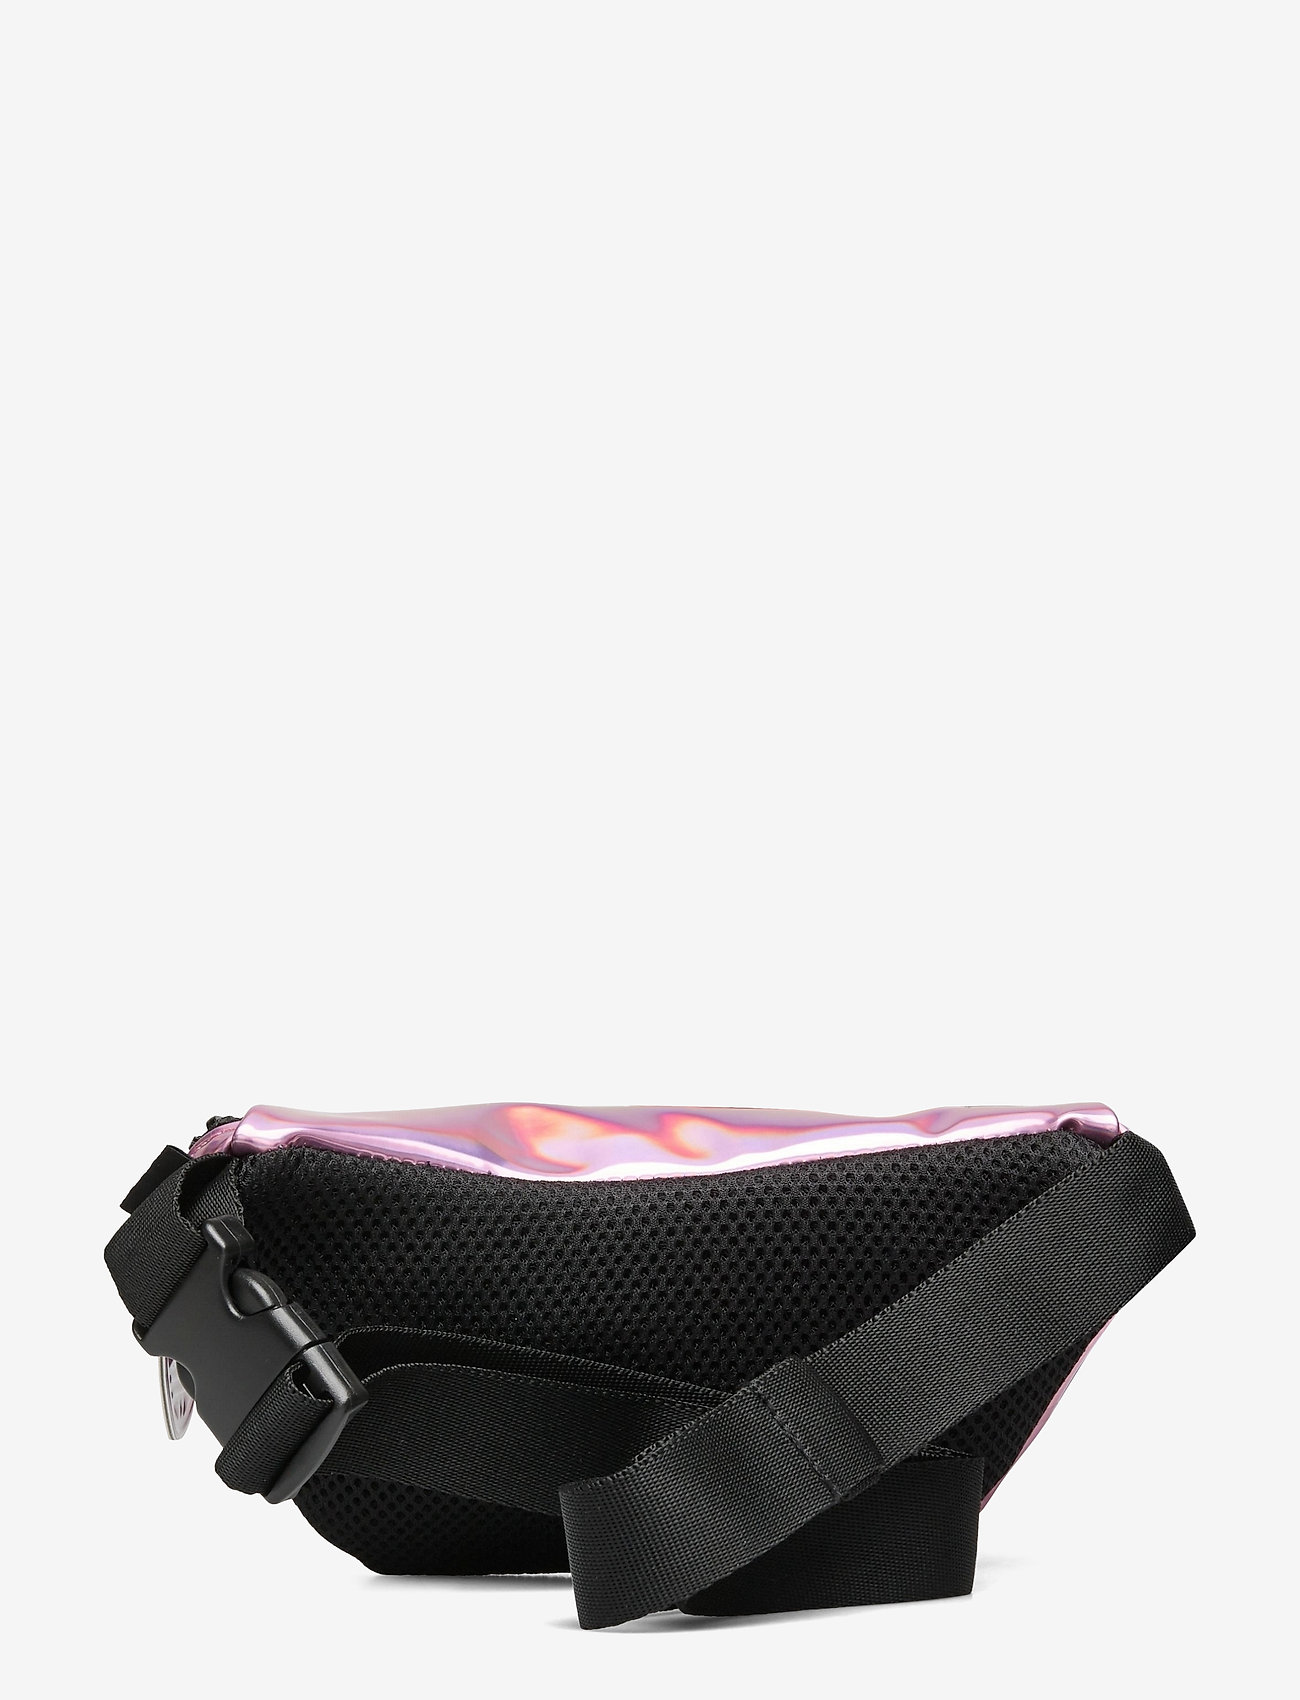 adidas Originals - Waist Bag W - giveaways - hazros - 1